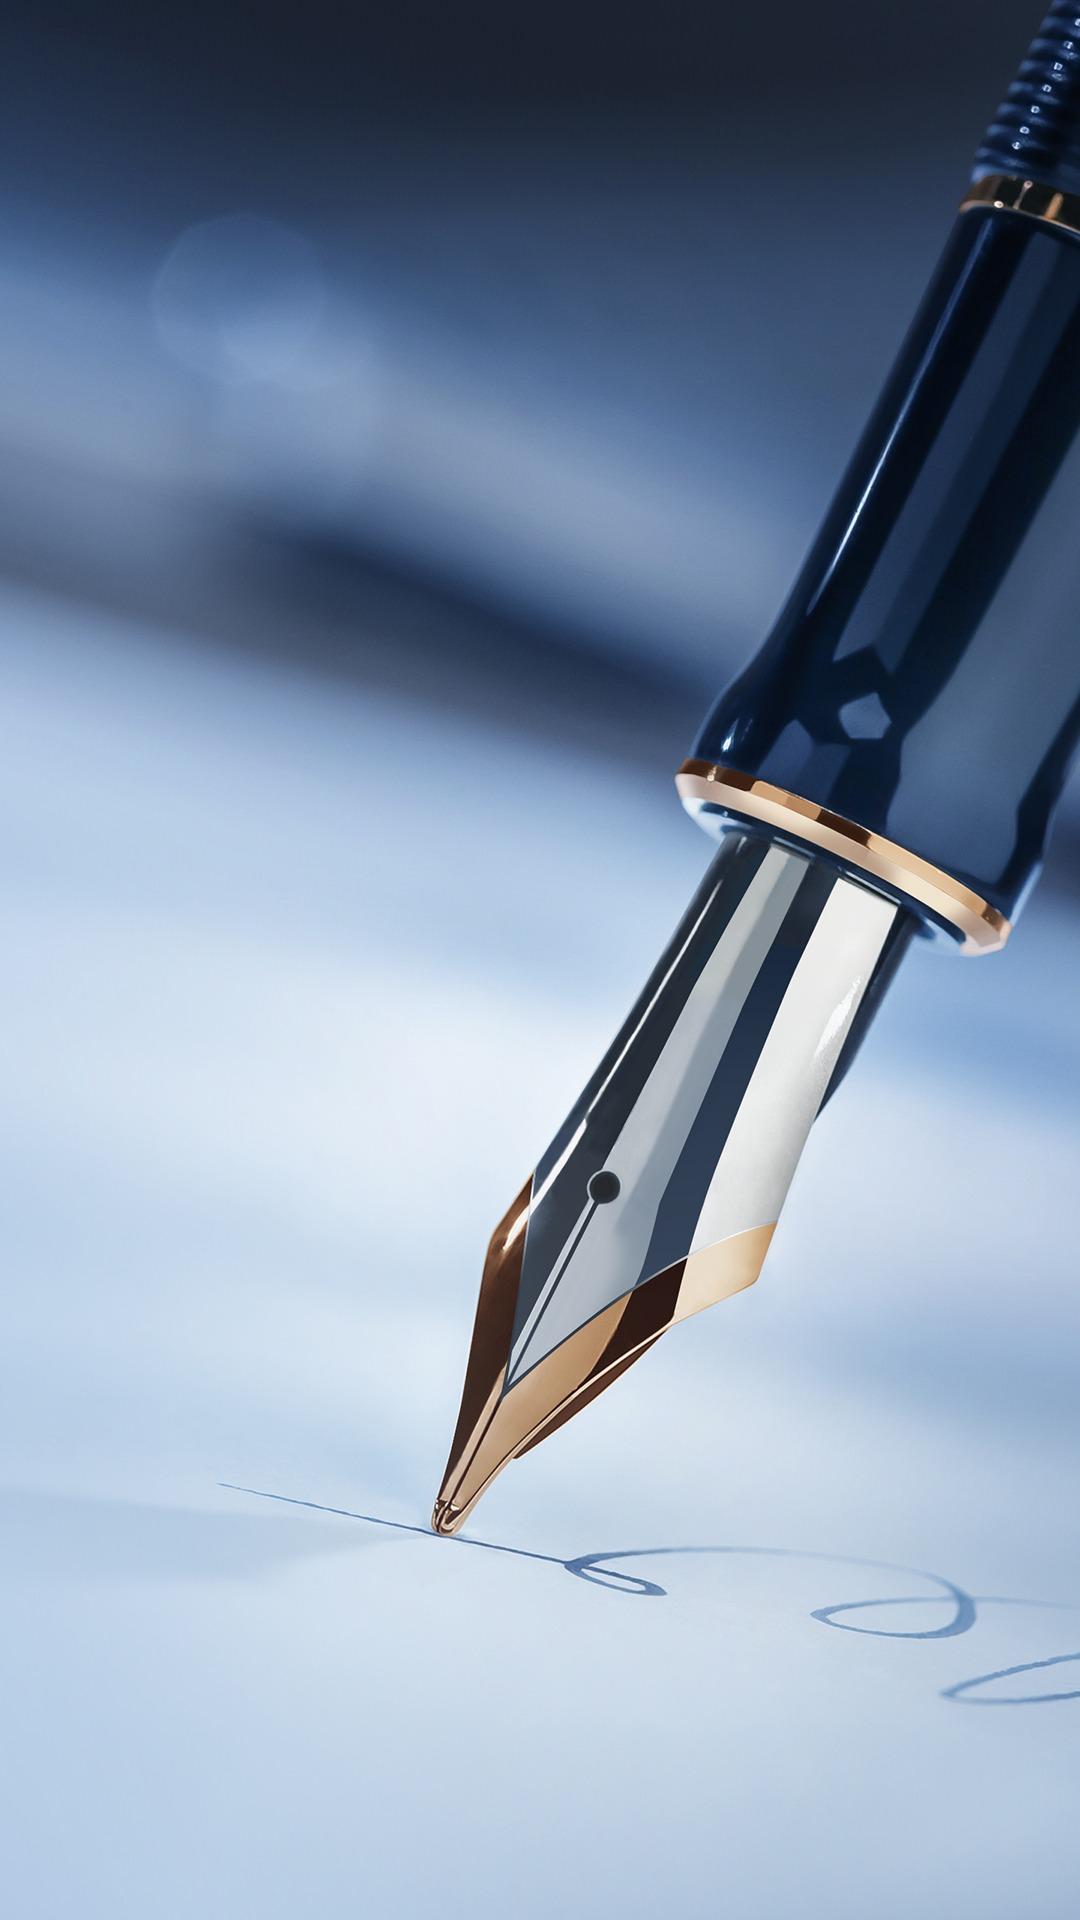 Download Pens Wallpaper Hd Backgrounds Download Itlcat